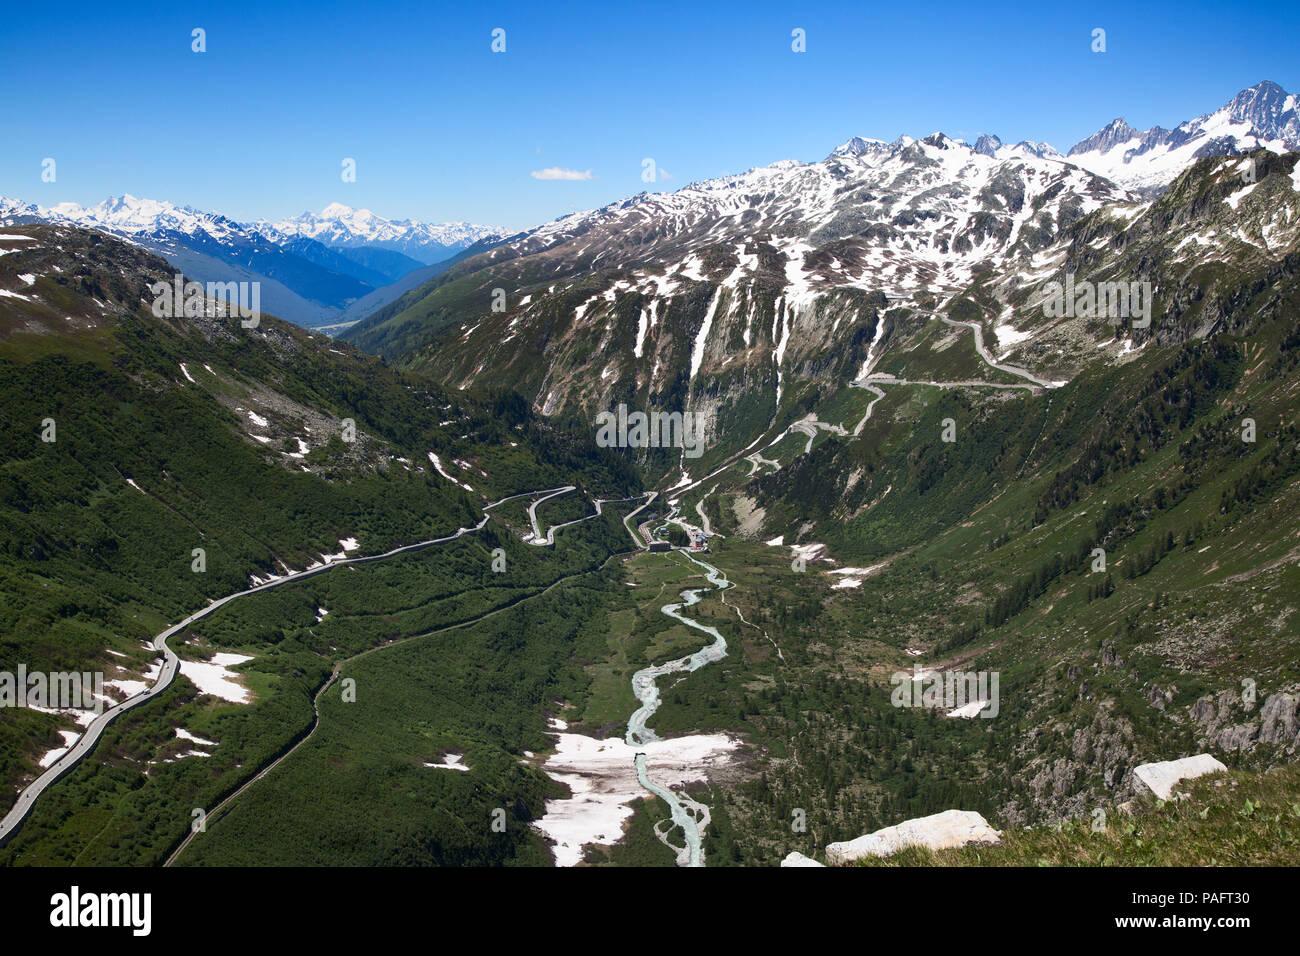 Swiss alps near Furka pass and Rhone glacier Stock Photo